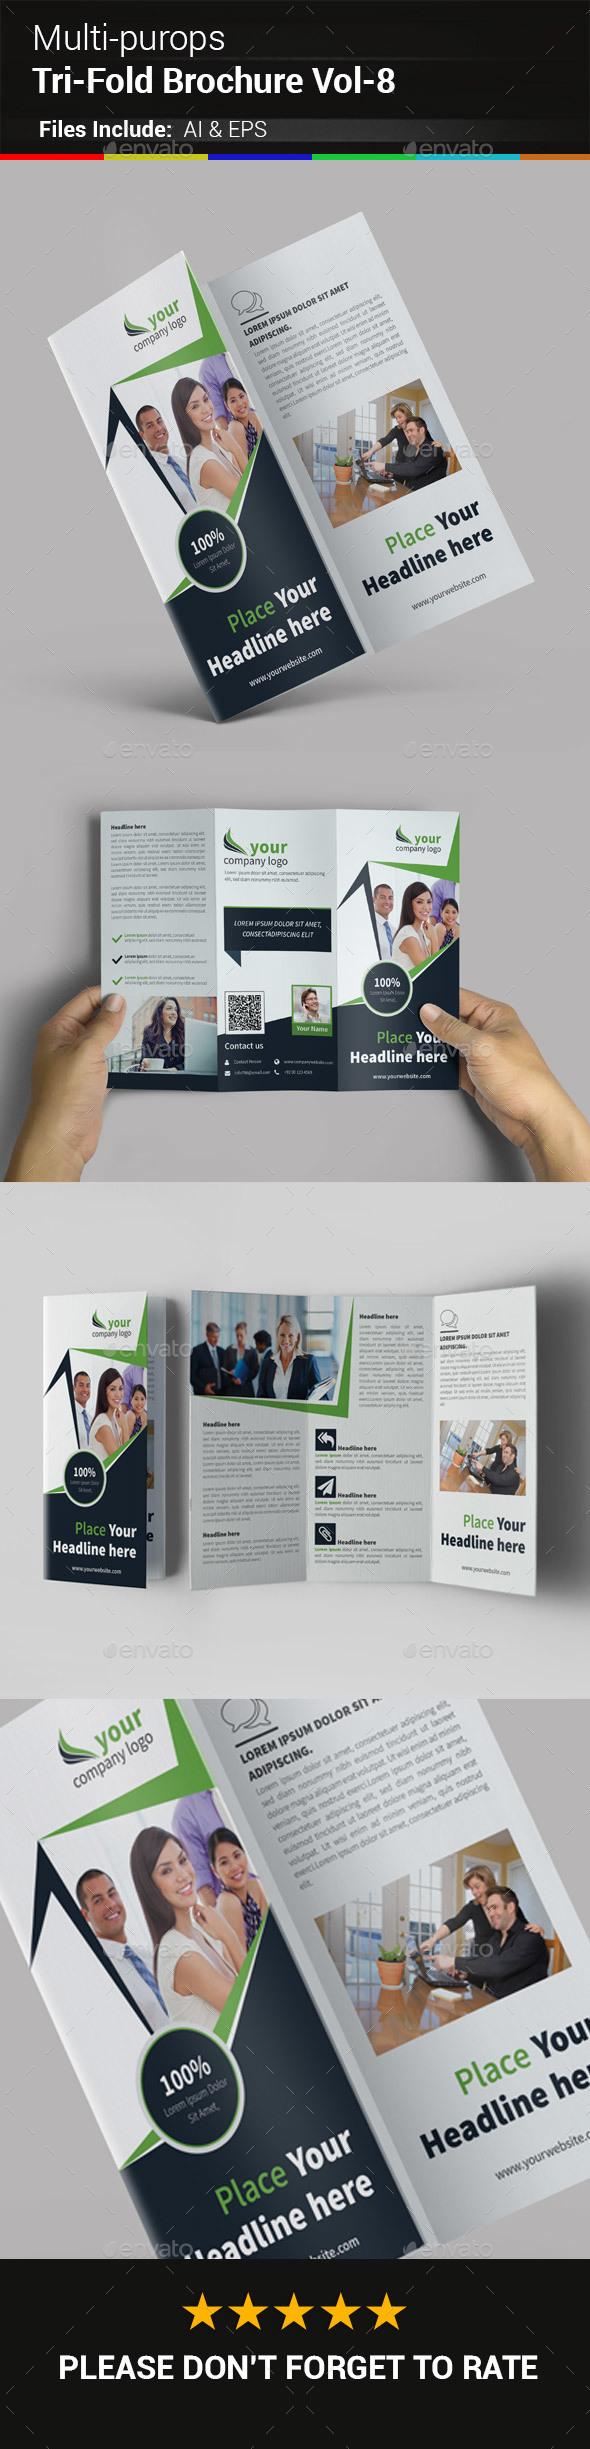 Multipurpose Business Tri-Fold Brochure Vol-8 - Corporate Brochures